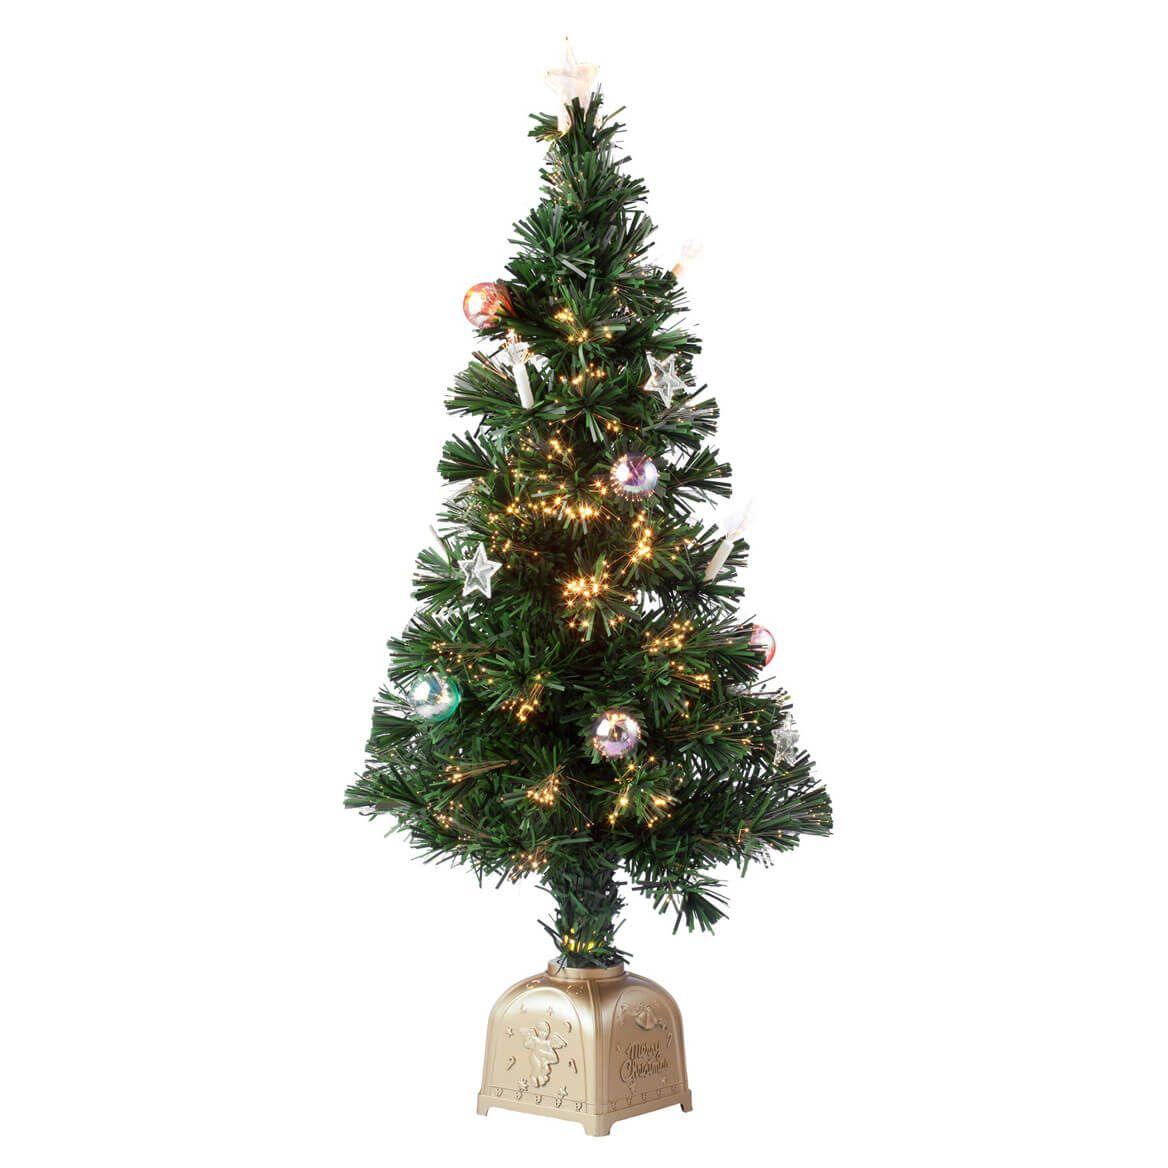 3' Musical Spinning Fiber Optic Tree by Holiday Peak™-349693